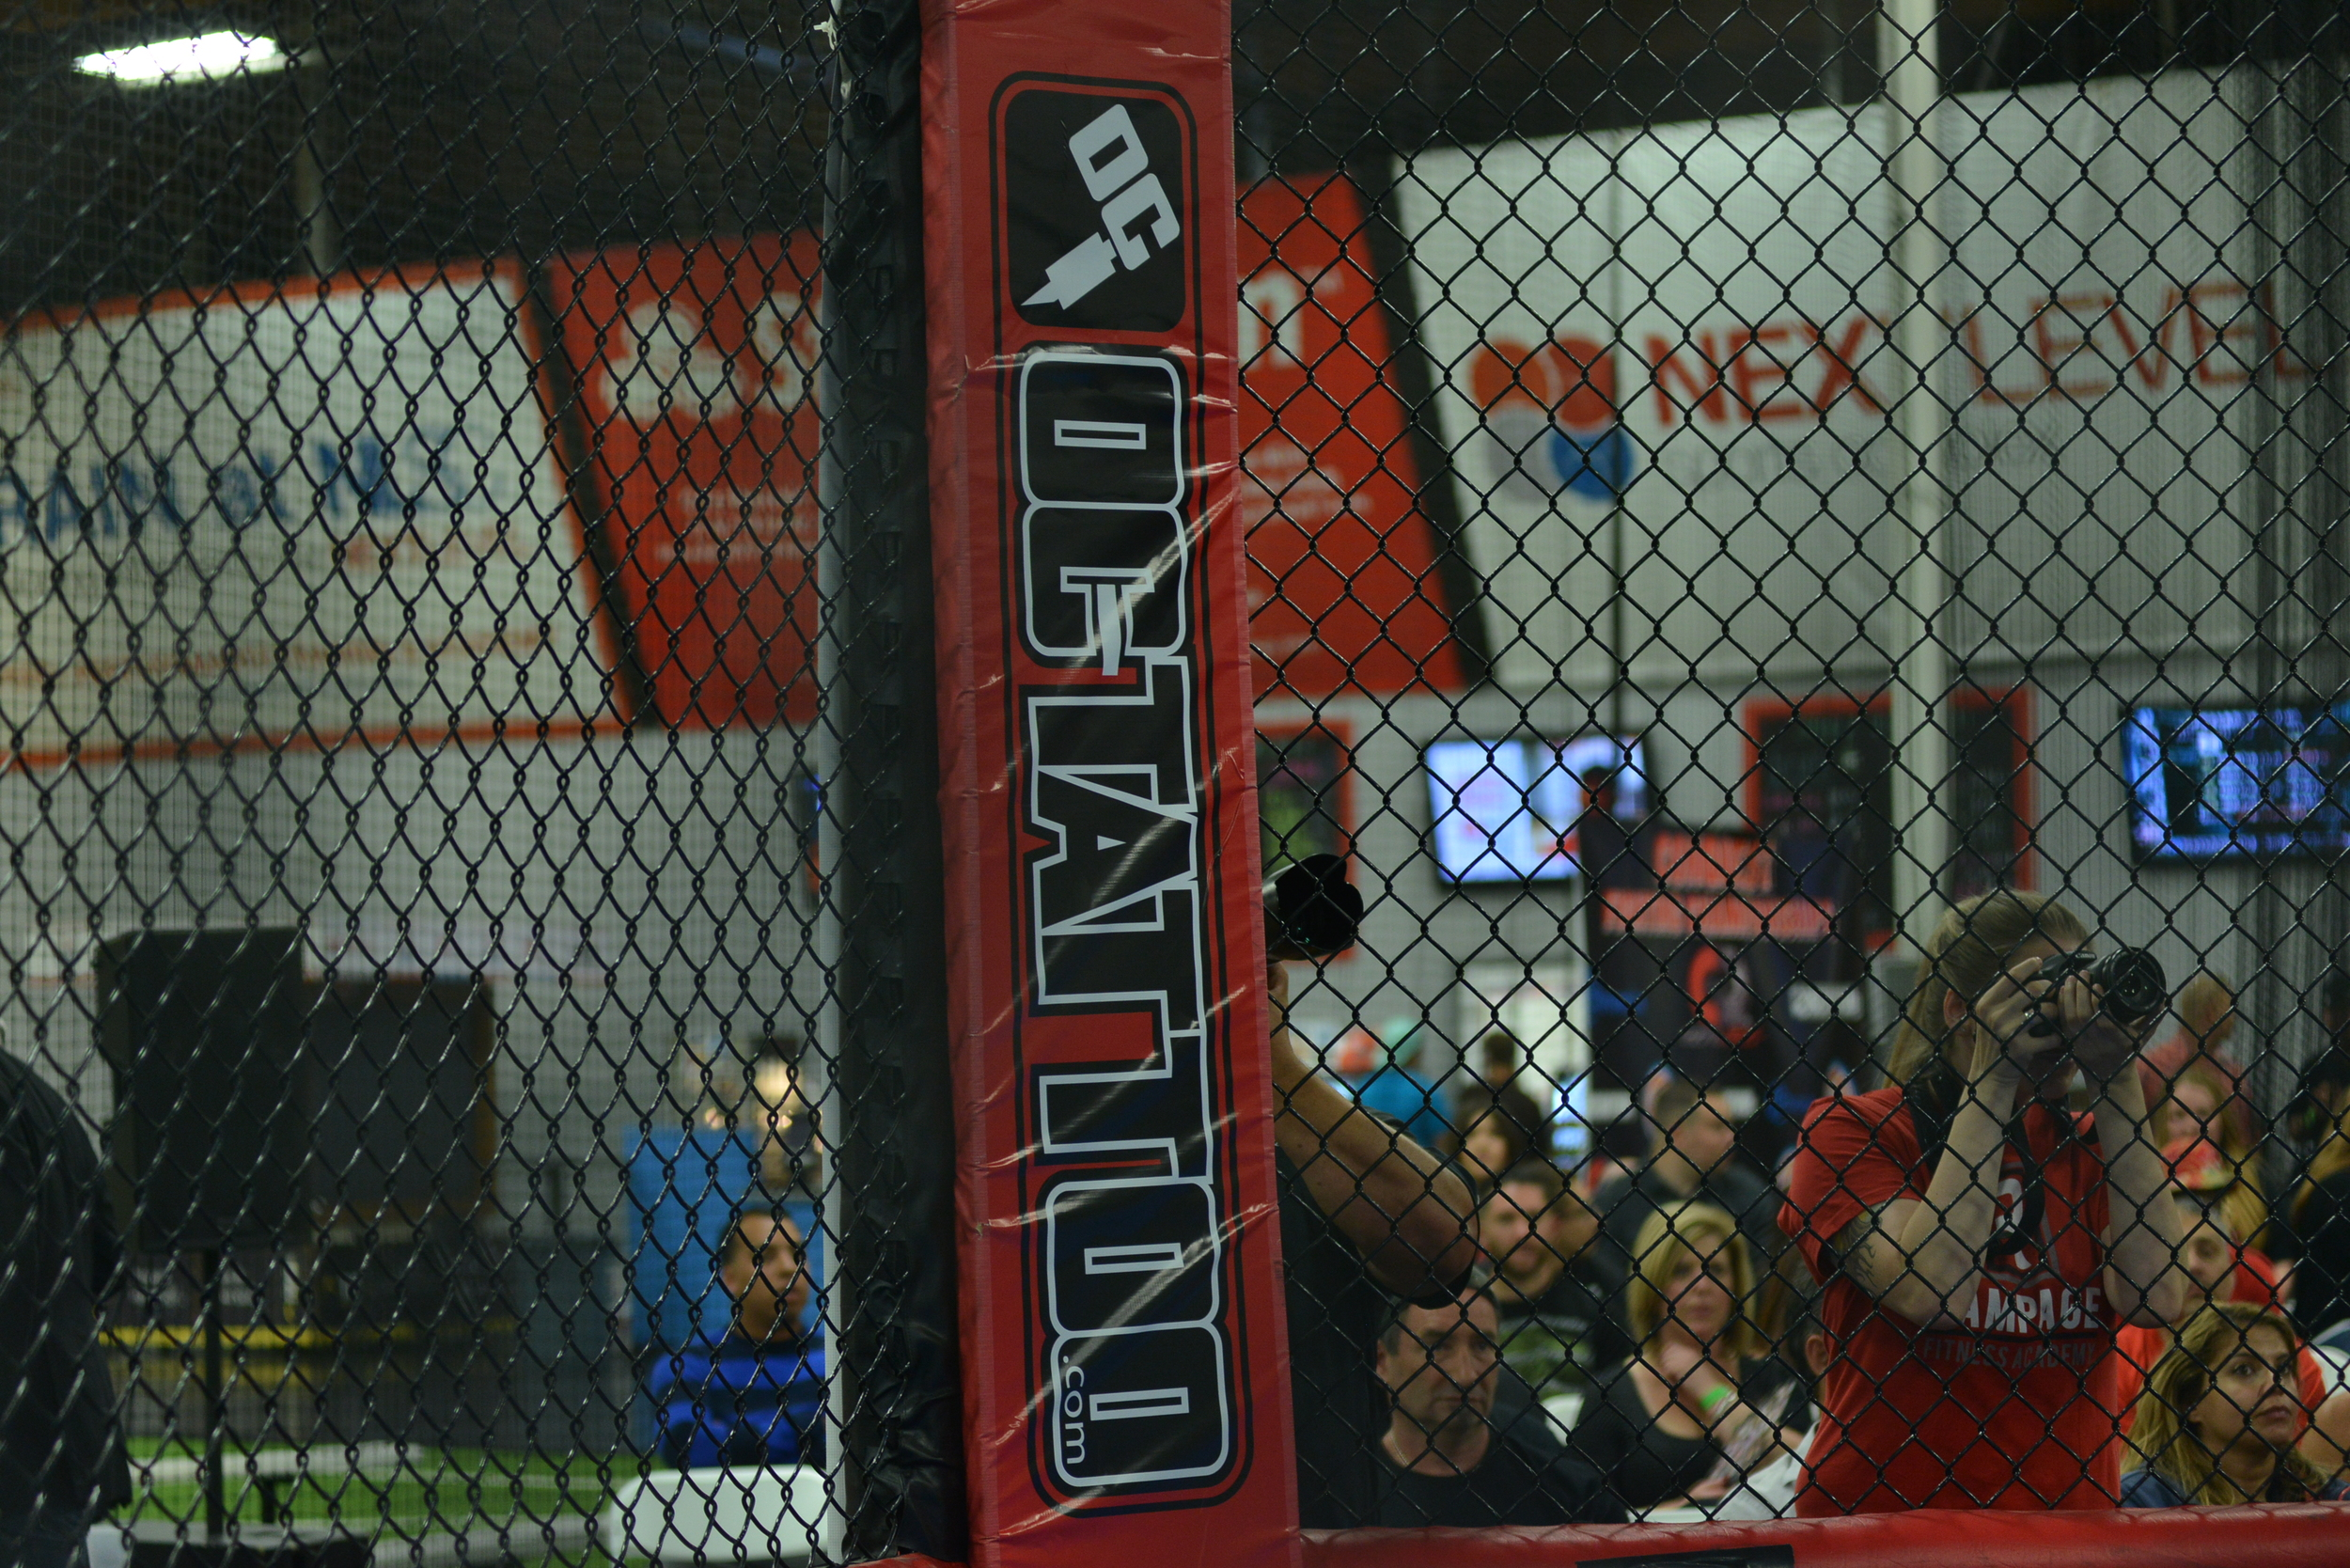 MMA Cage Sponsor OC tattoo